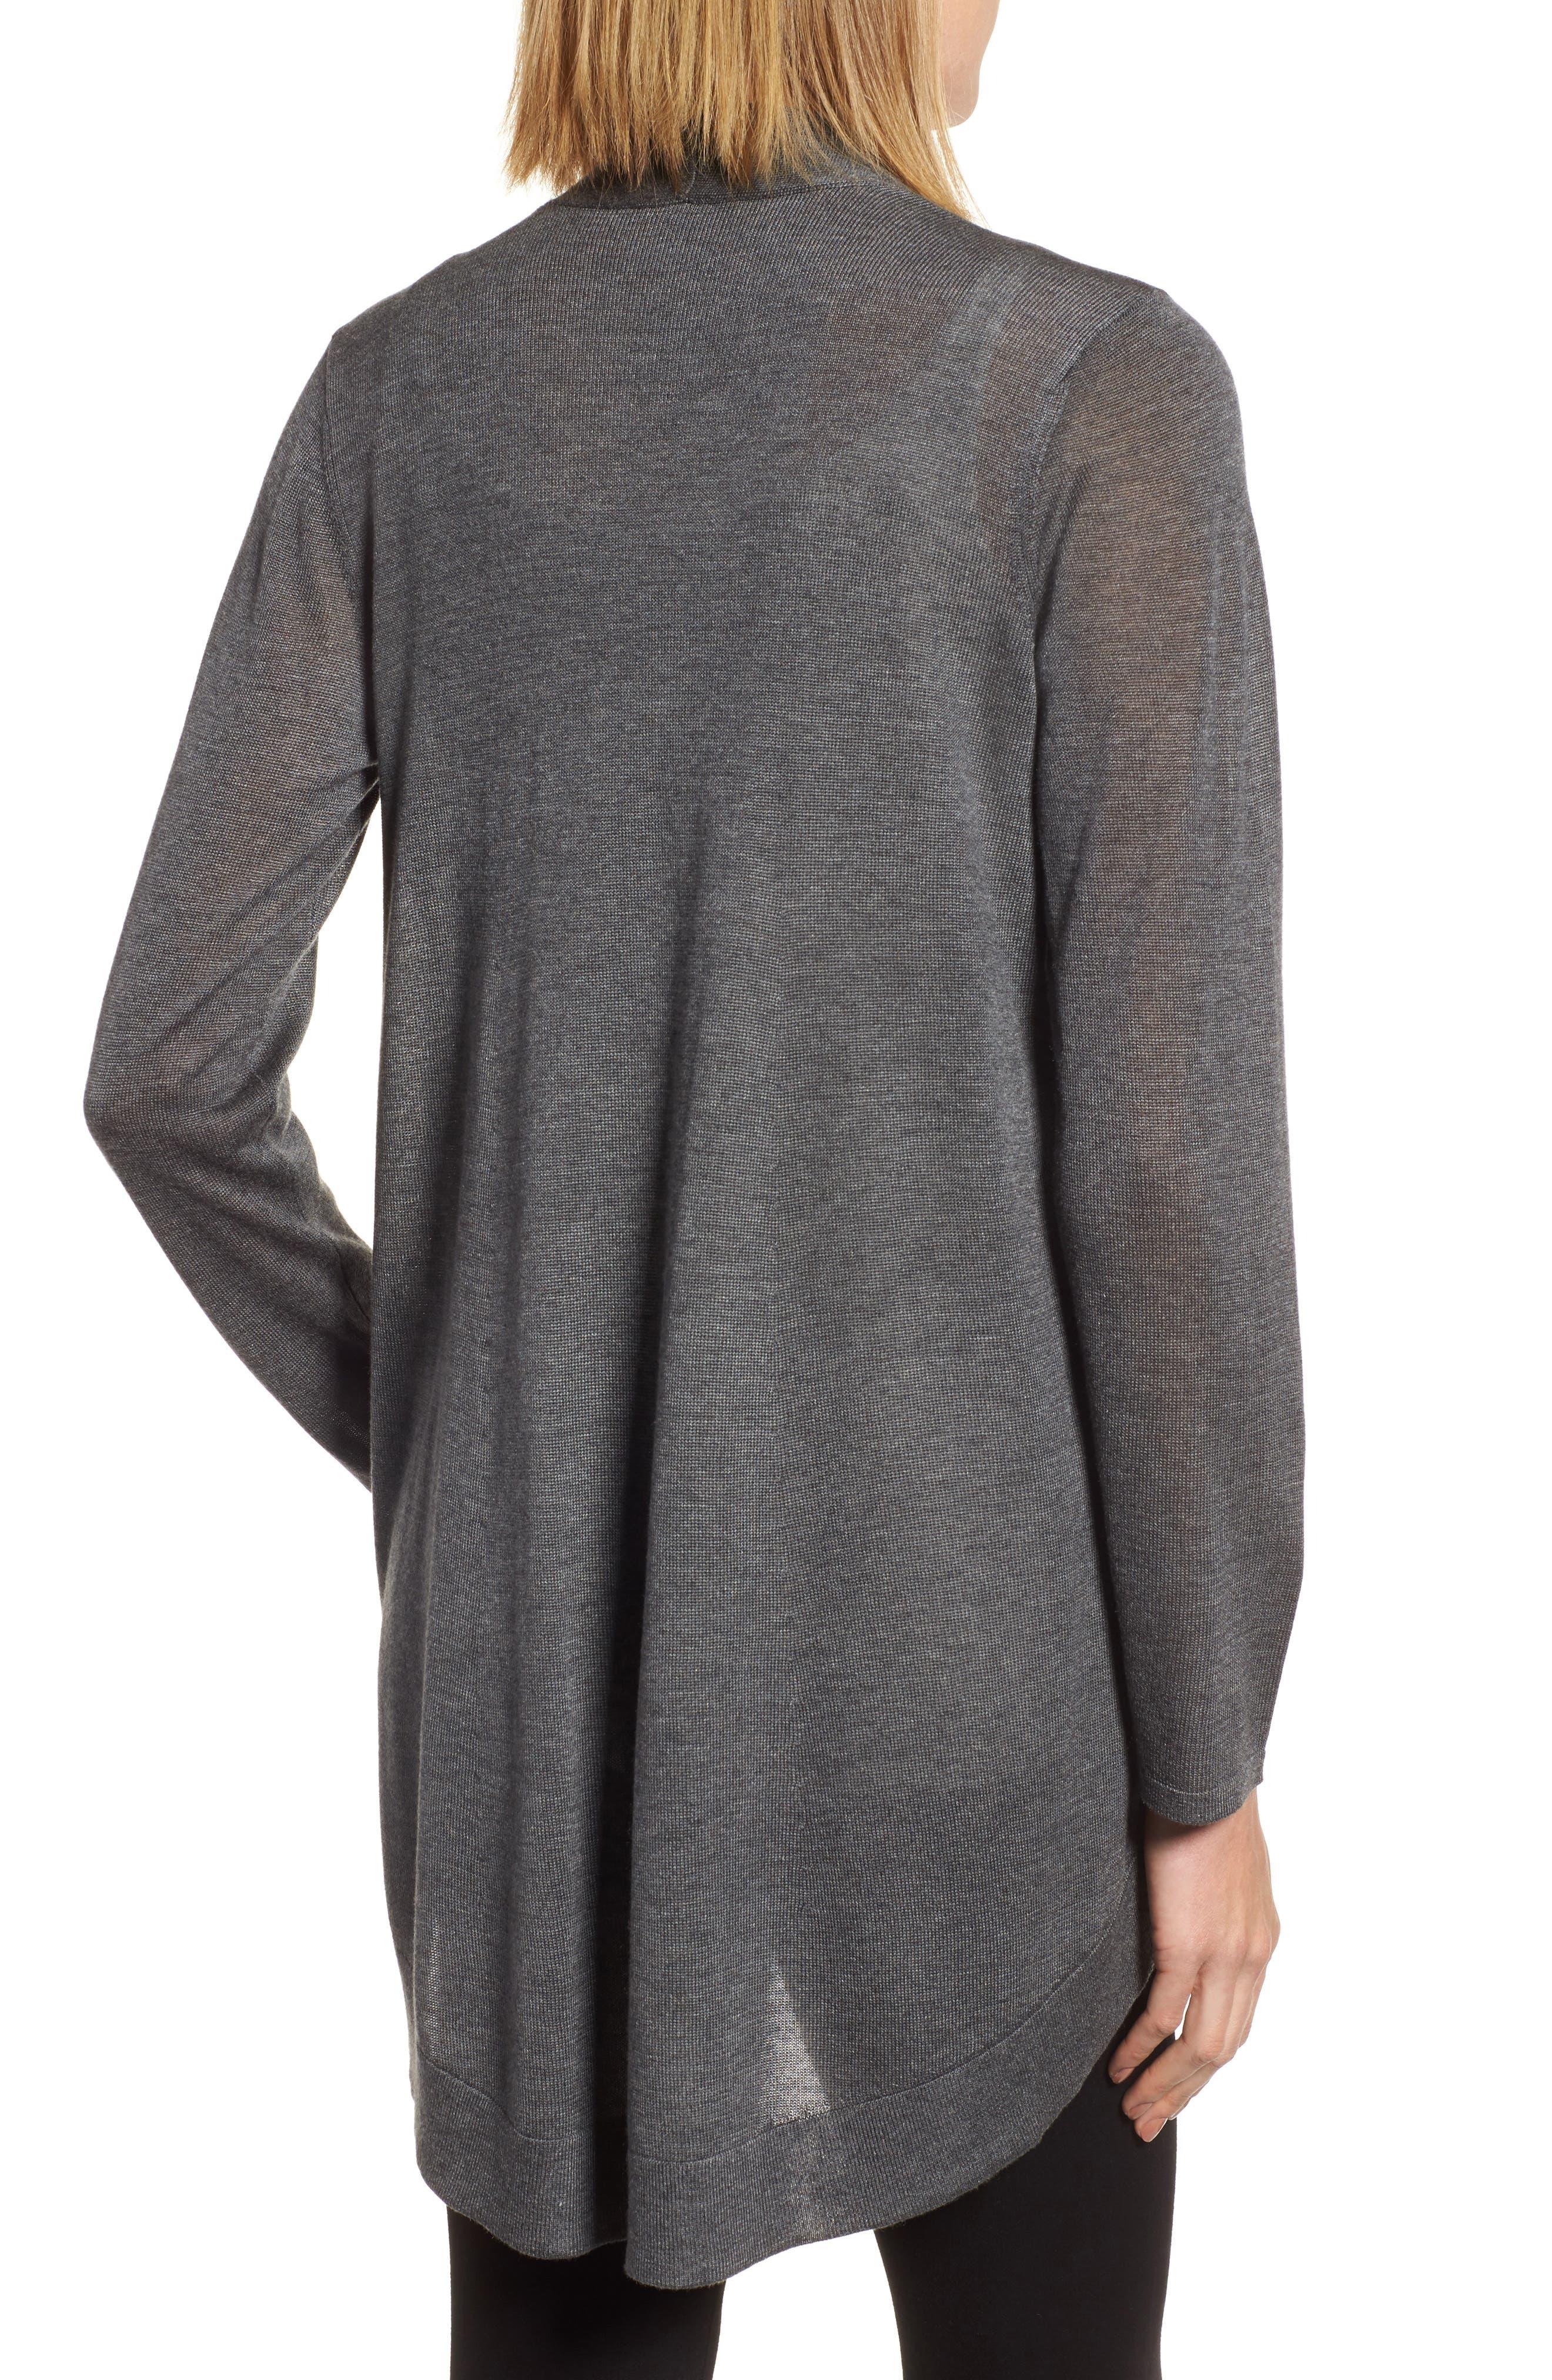 Tencel<sup>®</sup> Lyocell & Merino Wool Shaped Cardigan,                             Alternate thumbnail 2, color,                             030